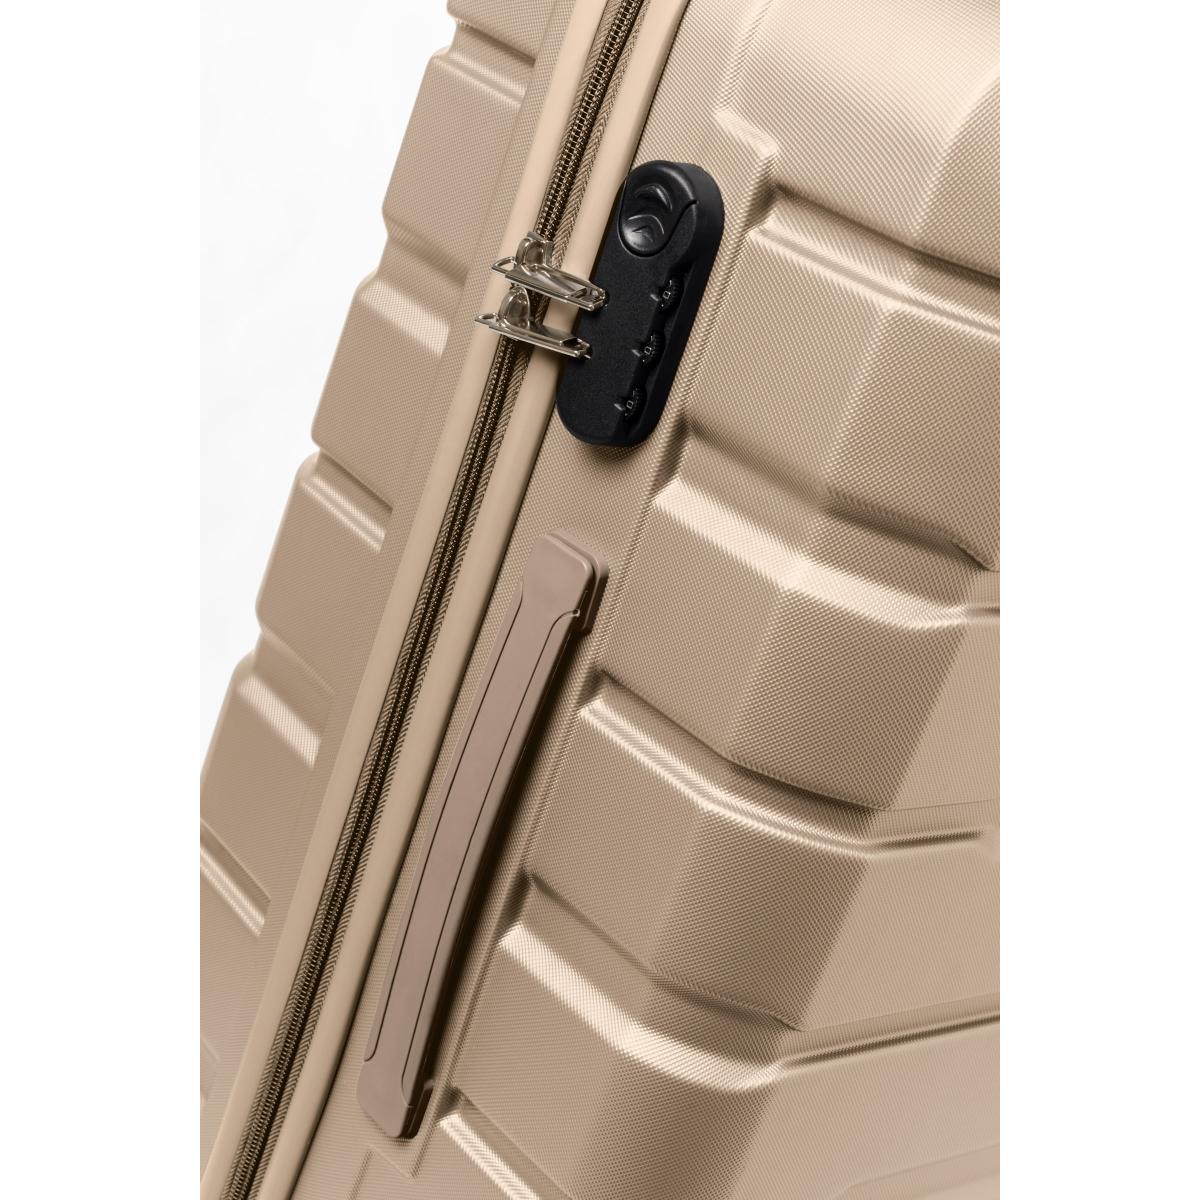 Gedox Abs Premium Tonaton 3'lü Valiz Seyahat Seti - Model:500.06 Gold